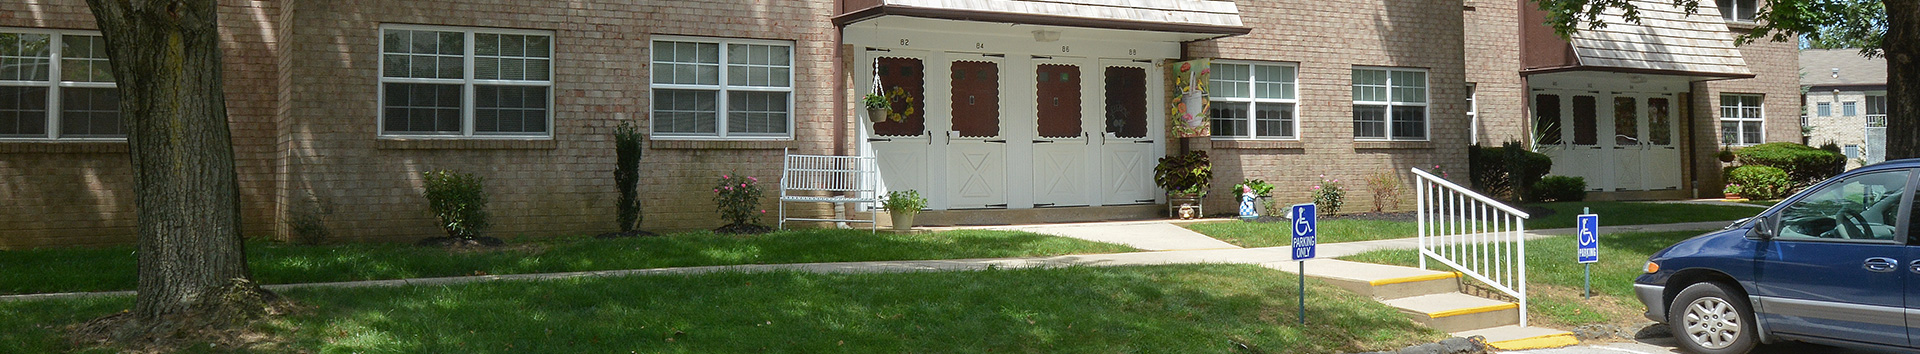 Parking of Springetts Apartments at Manor Communities, York/Pennsylvania